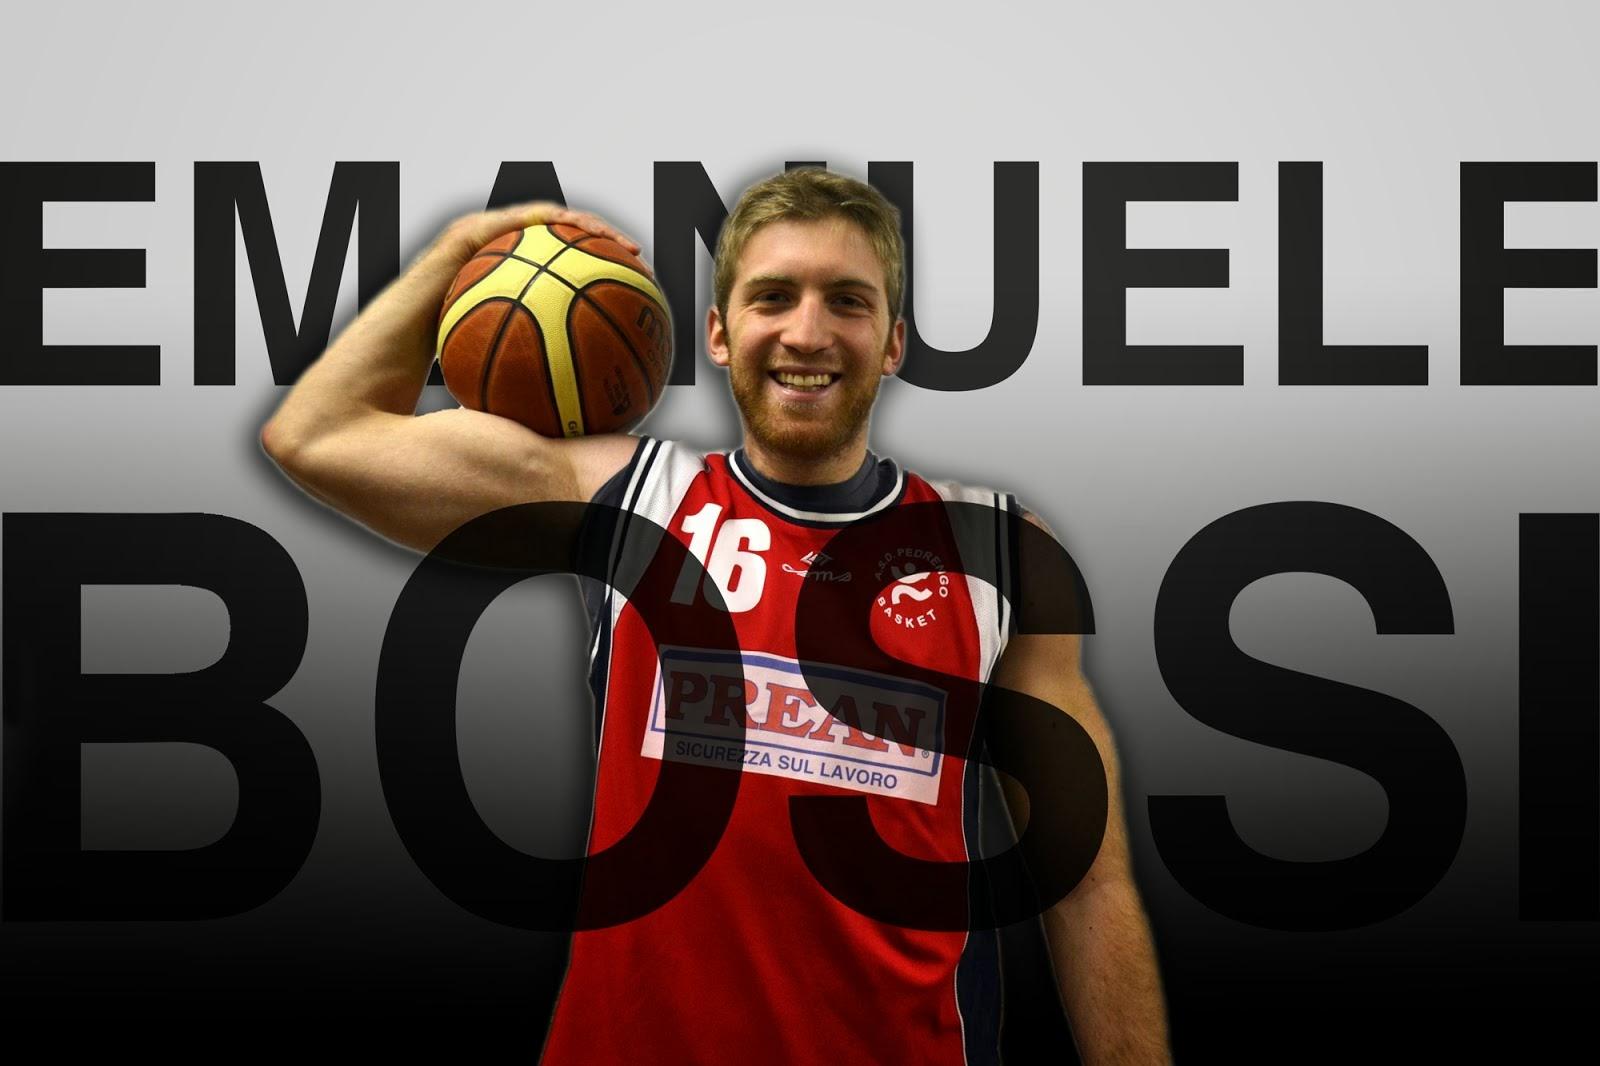 Emanuele Bossi